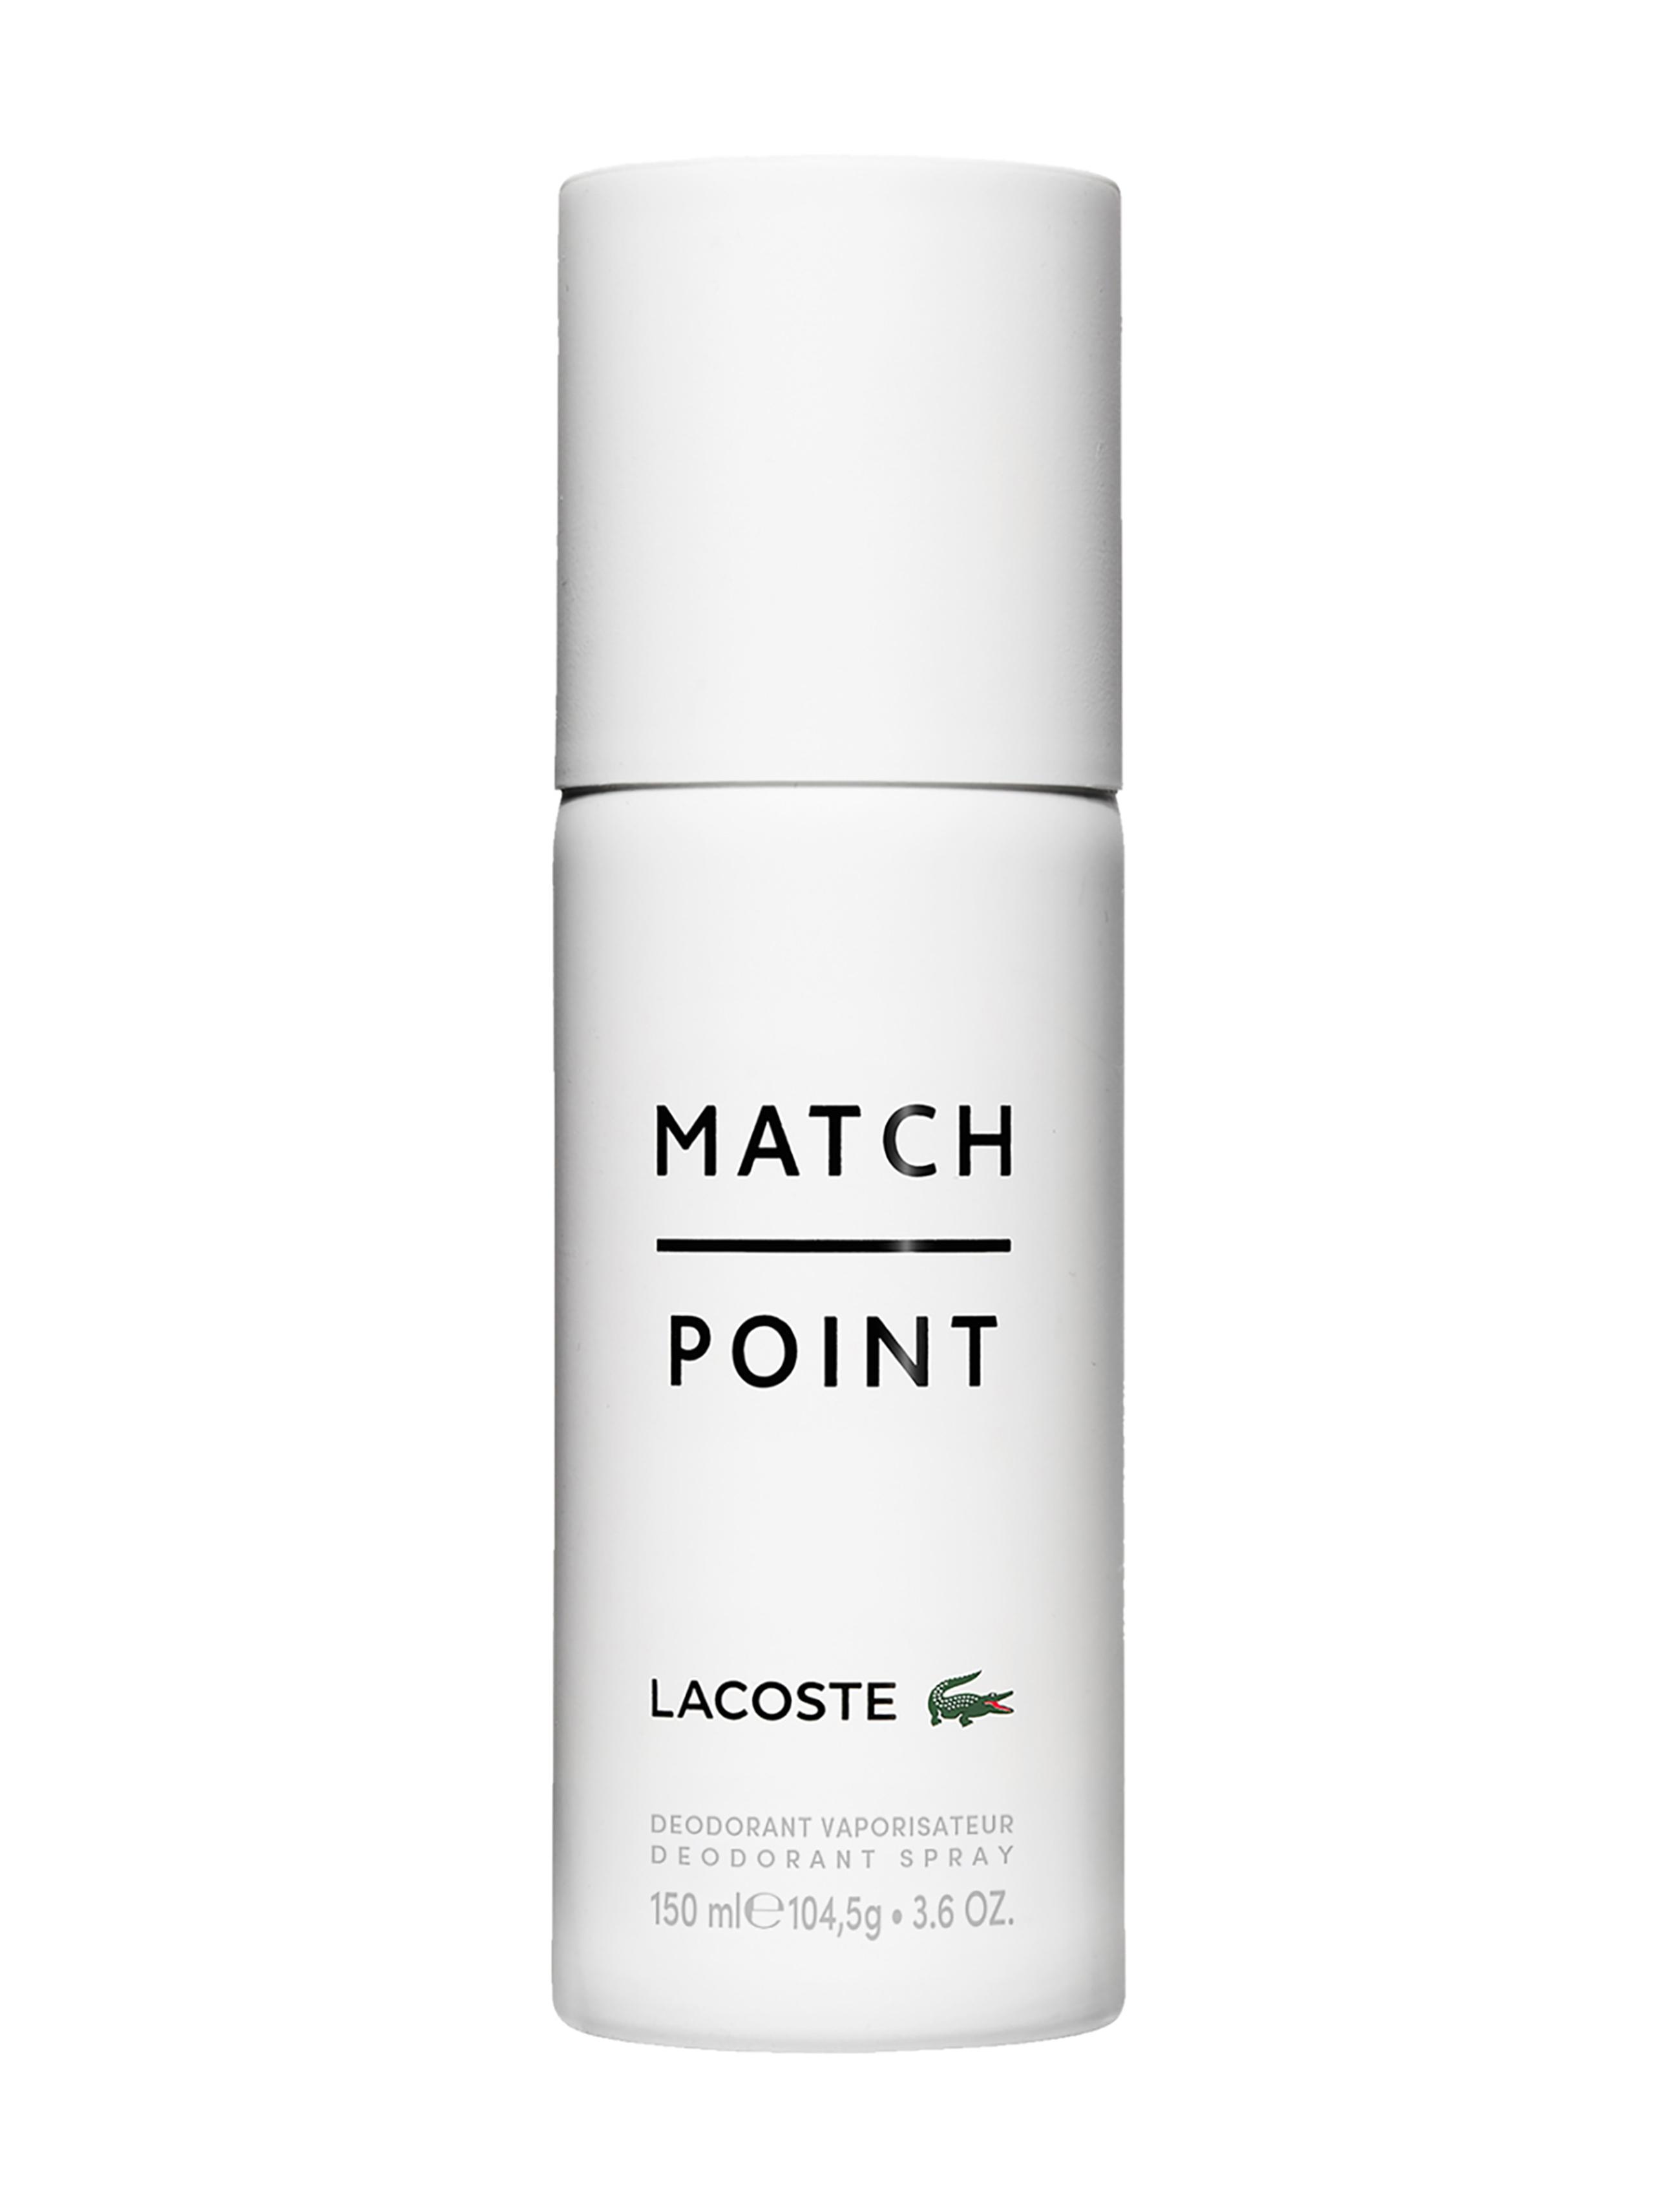 Lacoste Match Point Deodorant Spray, 150 ml